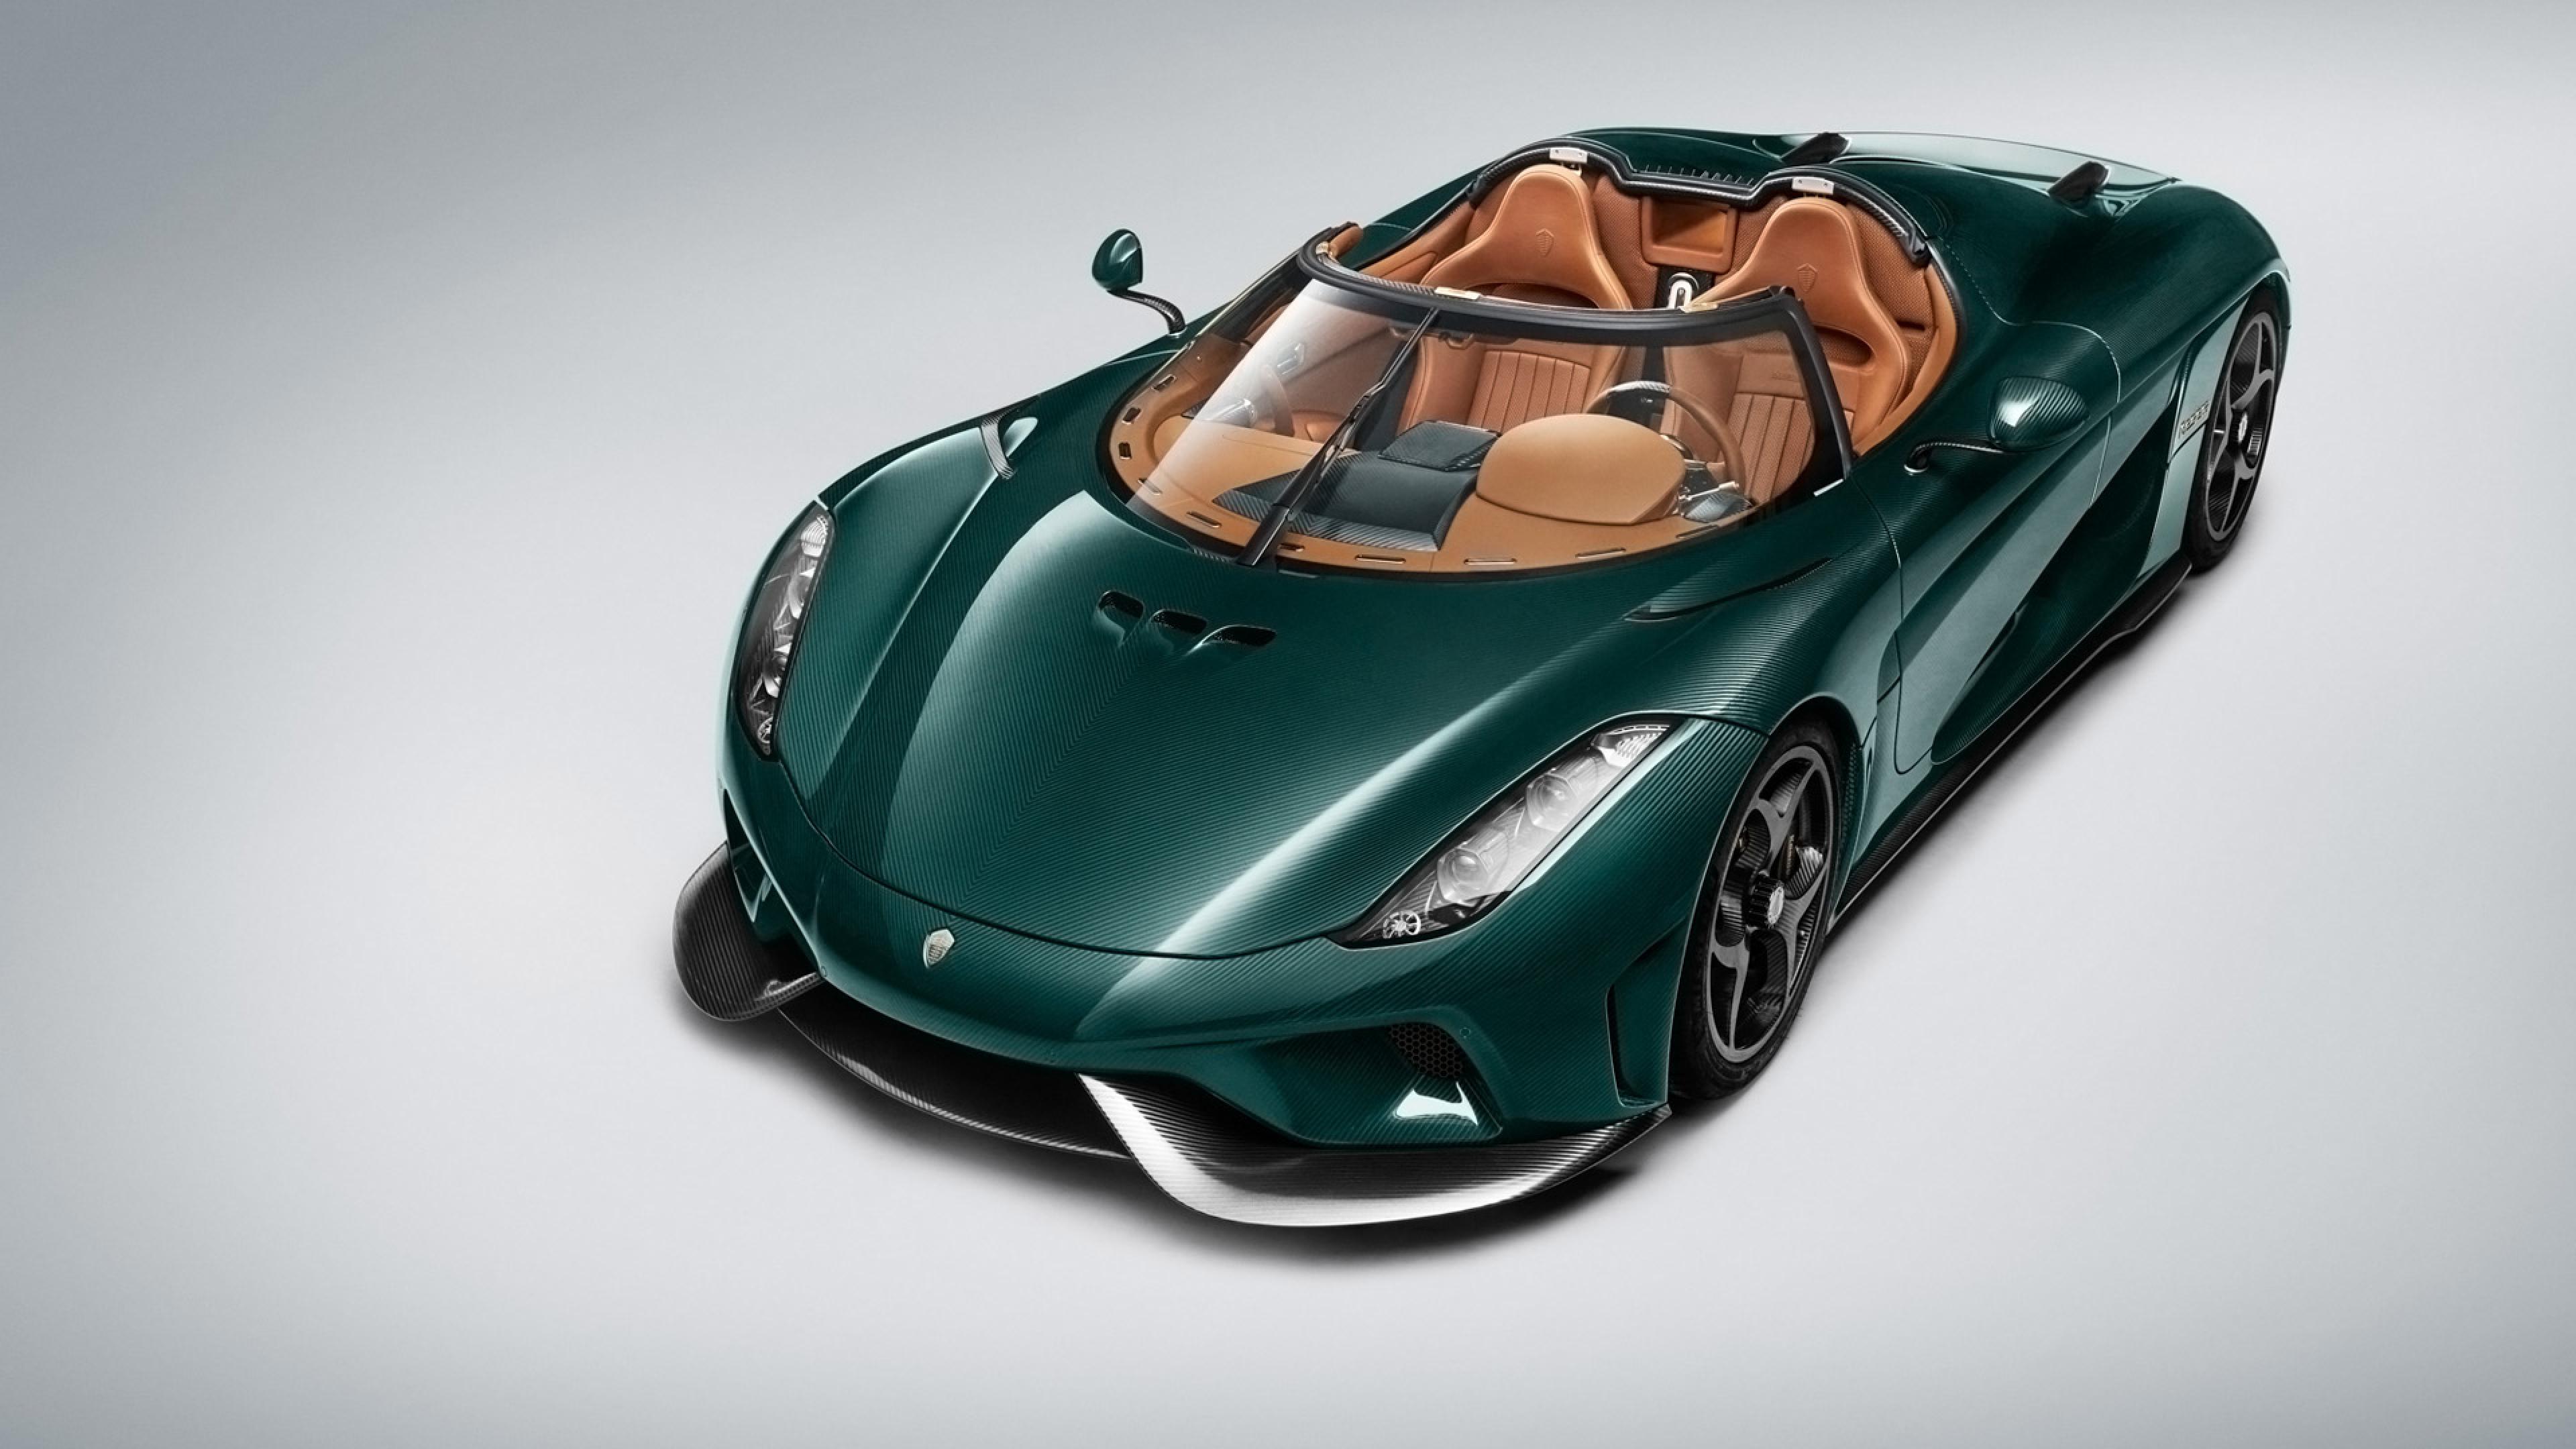 Green Car Convertible Koenigsegg Regera Wallpapers And Images